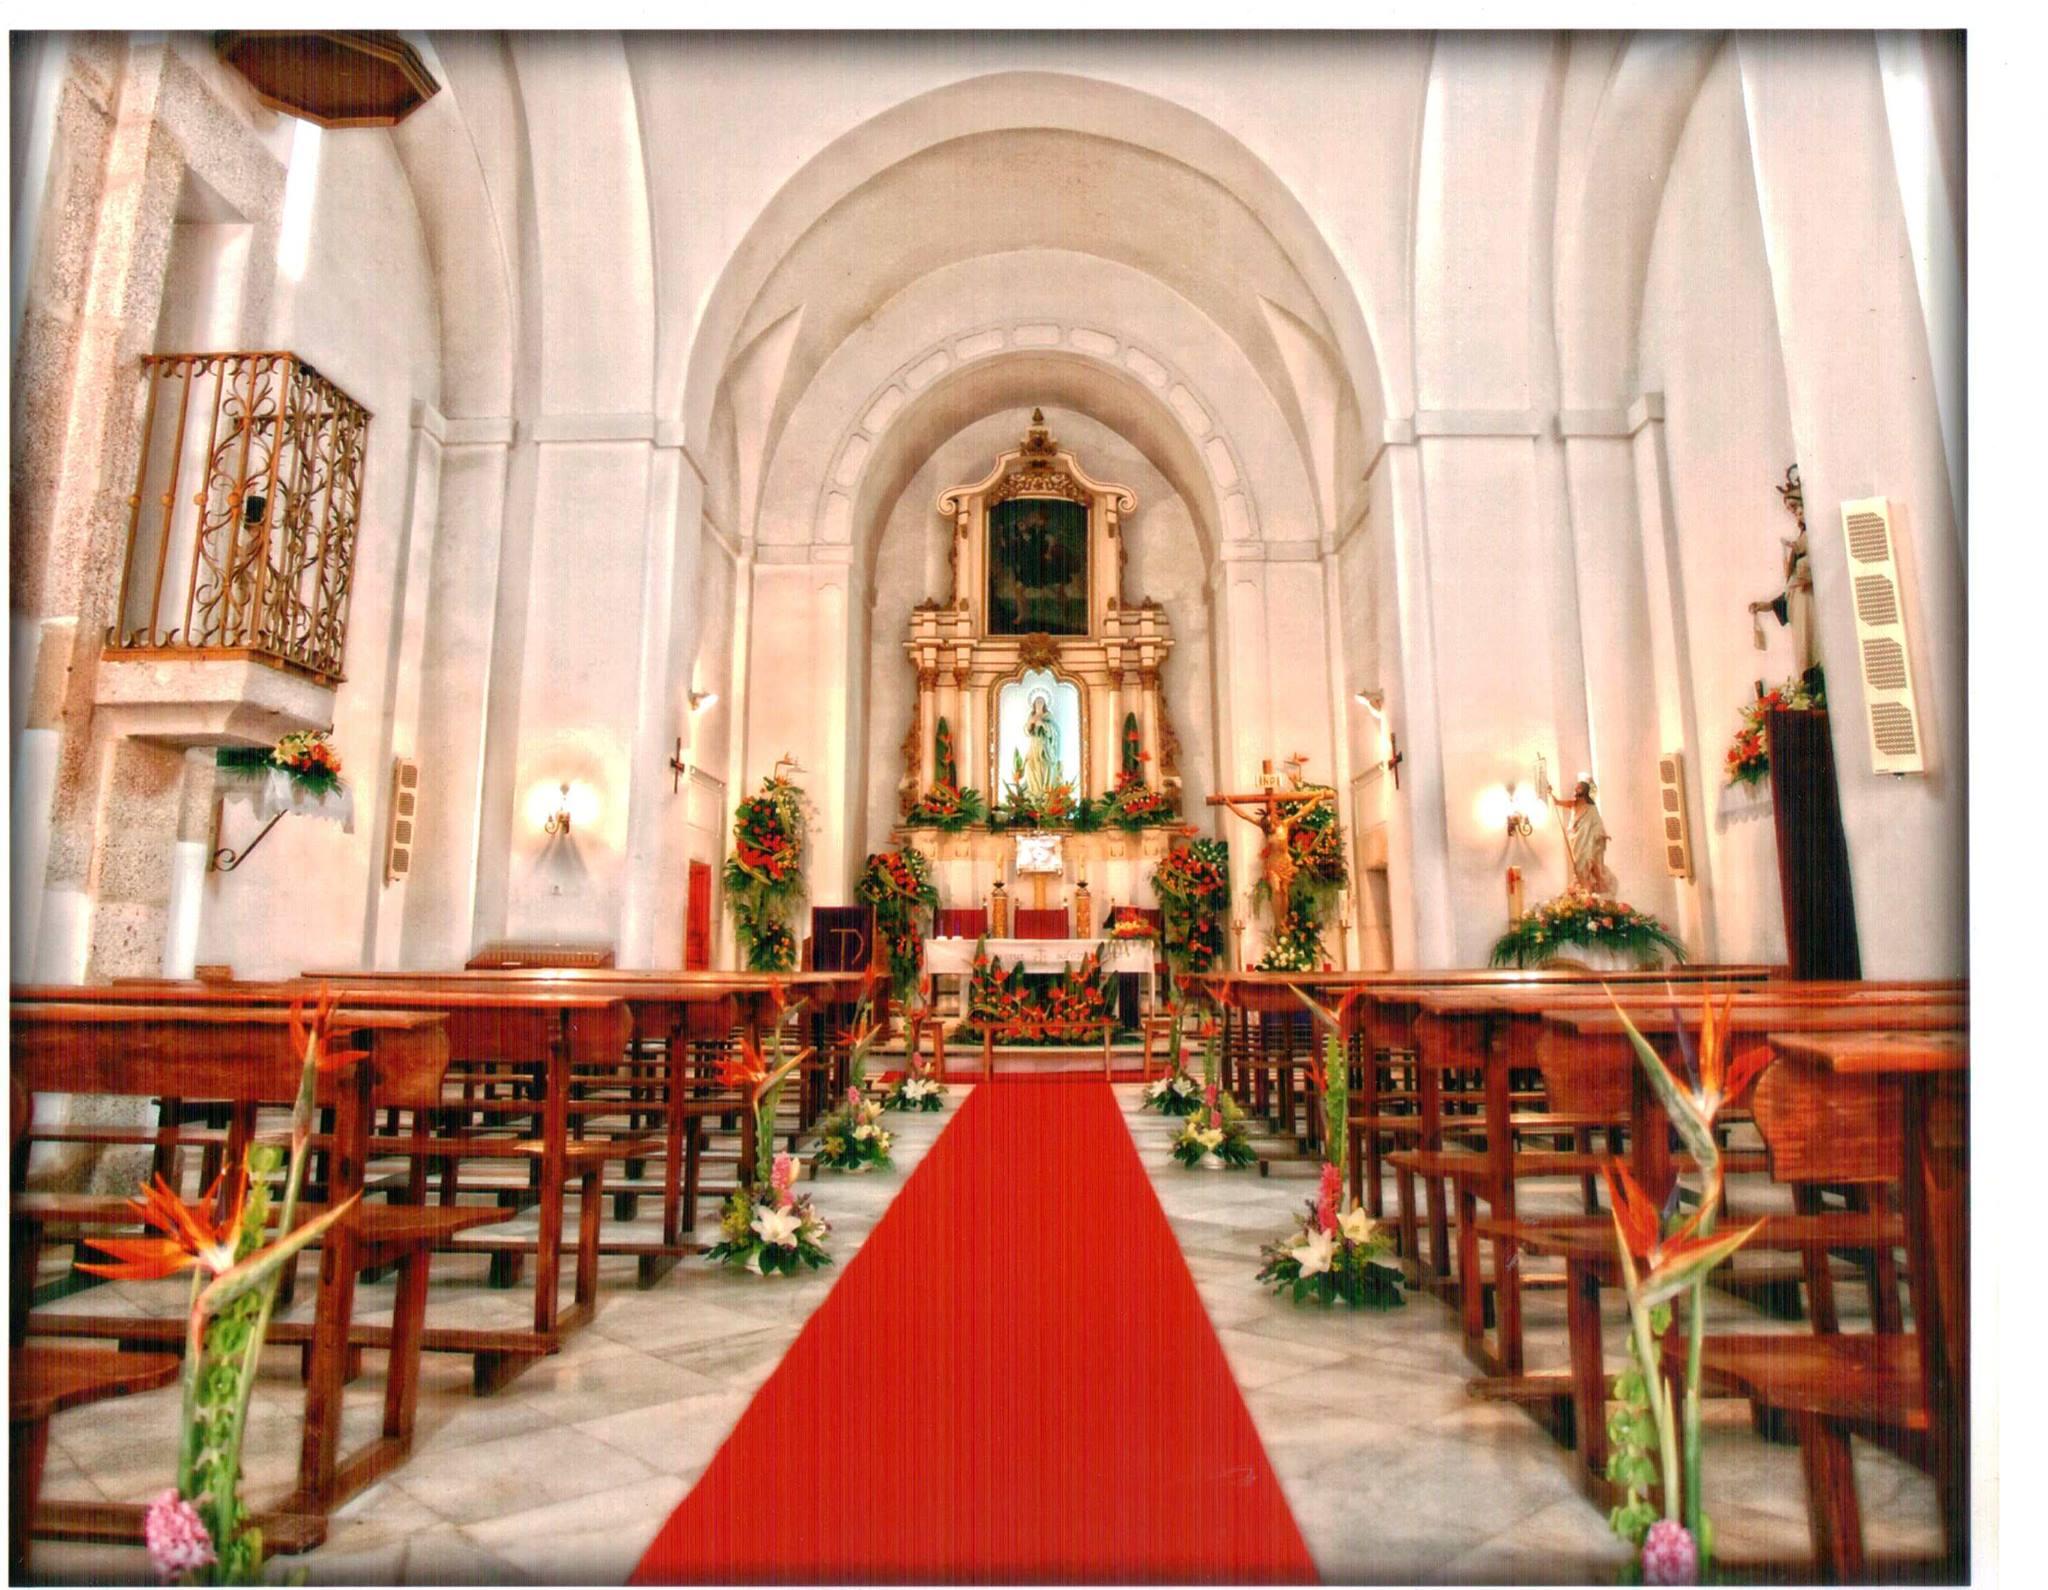 España Floristería vivero en Merida Flornaturex